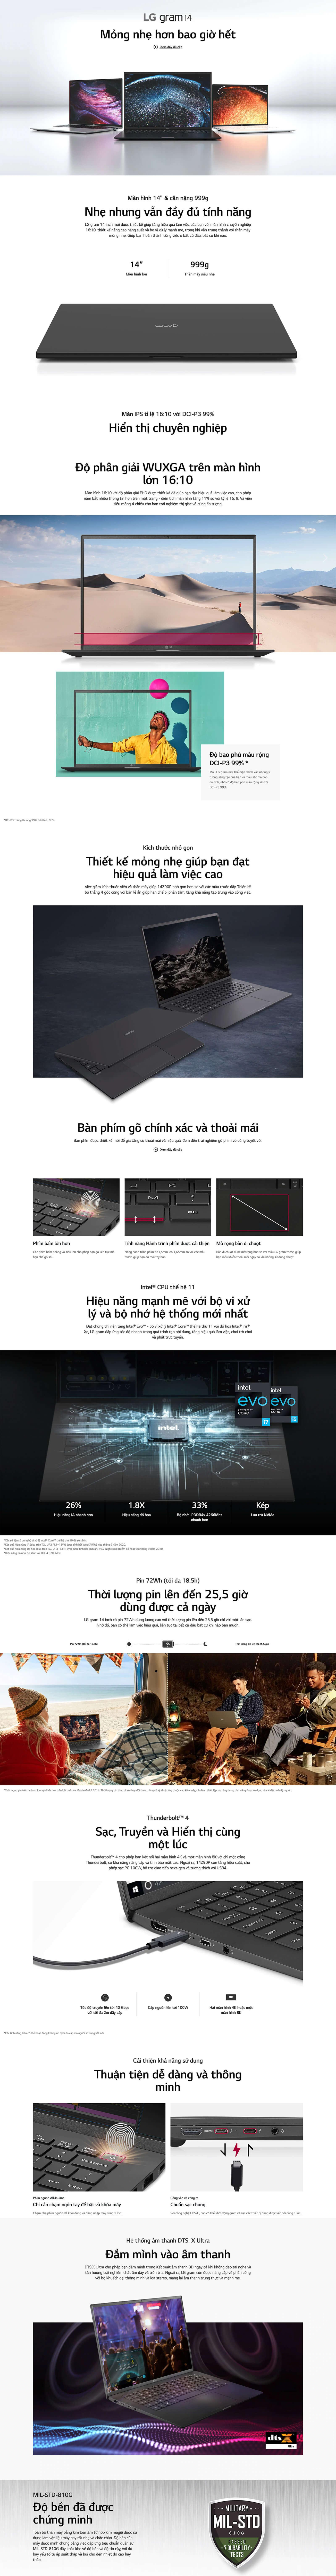 "Laptop LG Gram 2021 14"" (14Z90P-G.AH75A5) - i7 Gen 11th / 16GB / 512GB / Intel® Iris® Xe Graphics"